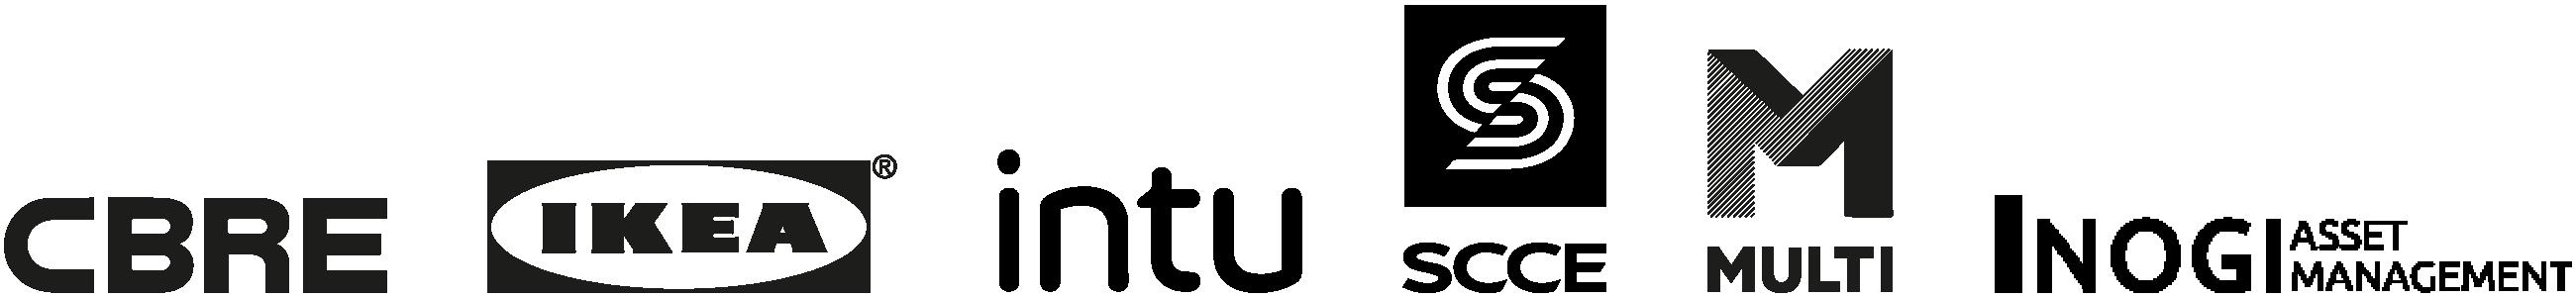 MADHOUSE_-_WEB_V2_LFF_-_CLIENTES